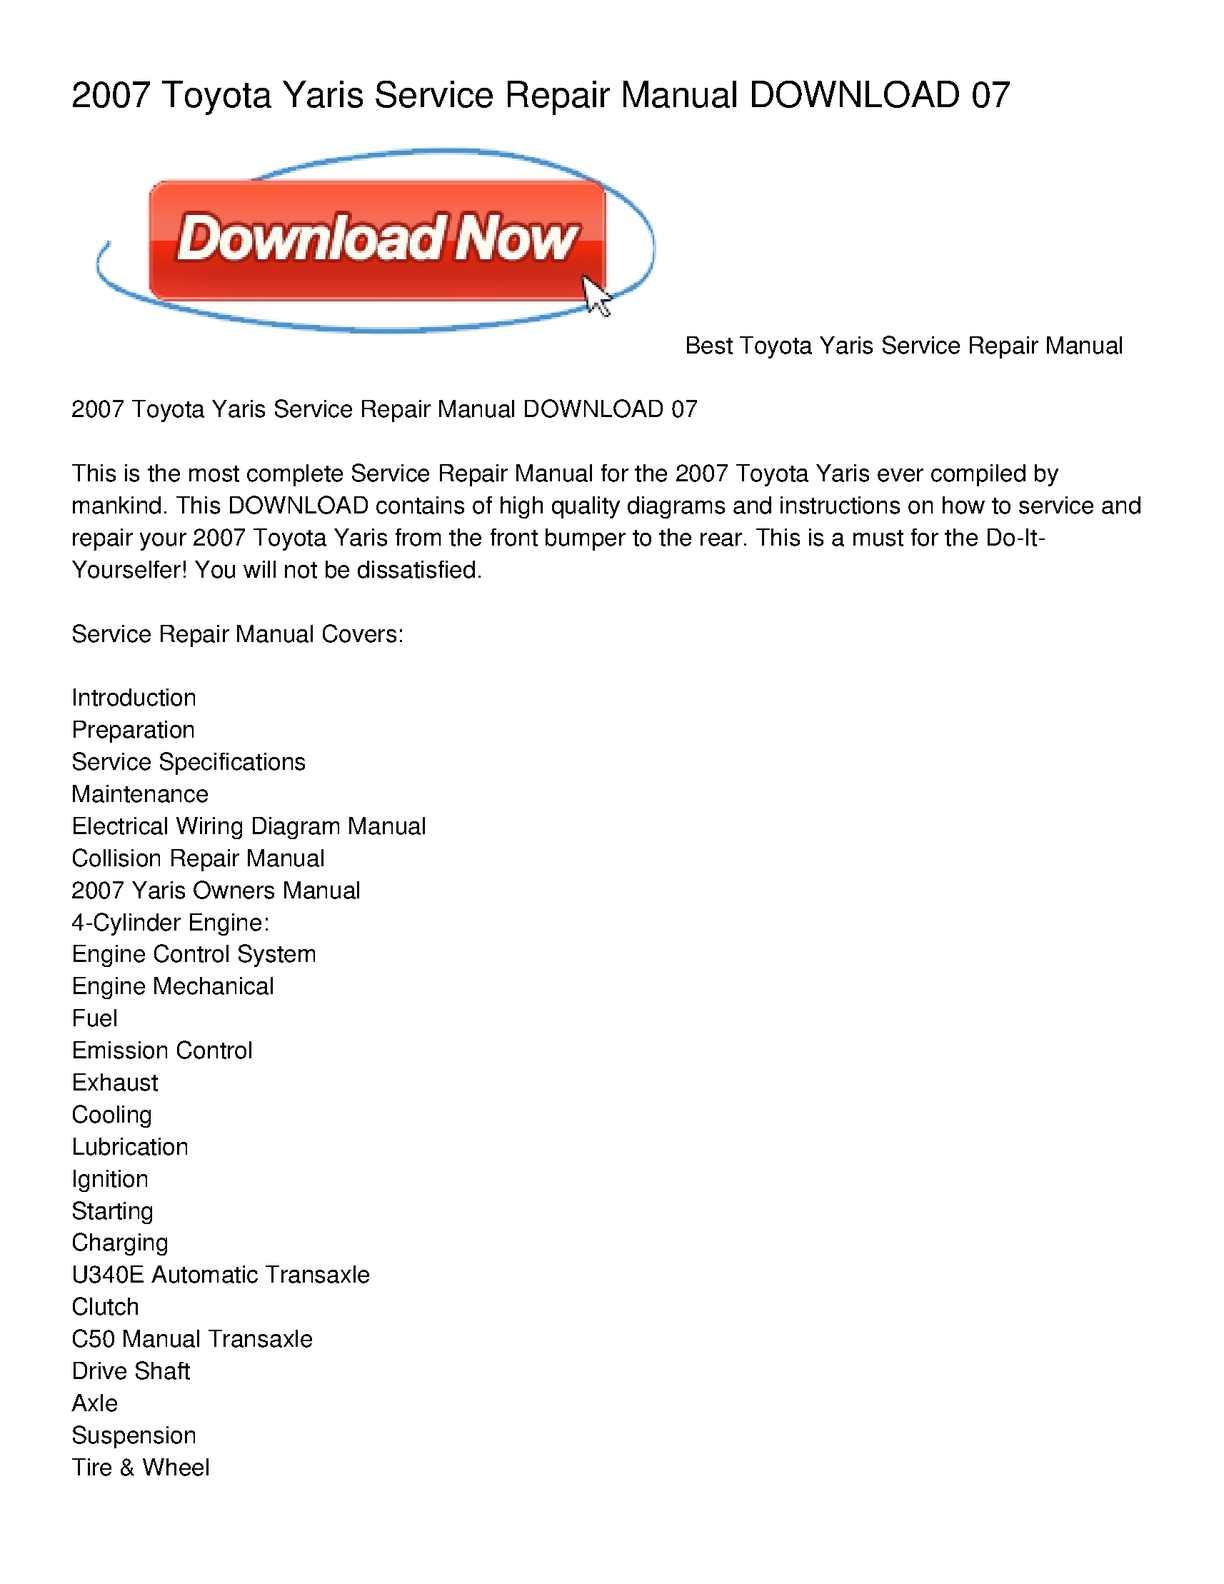 Toyota Yaris Toyota Maintenance Schedule Pdf